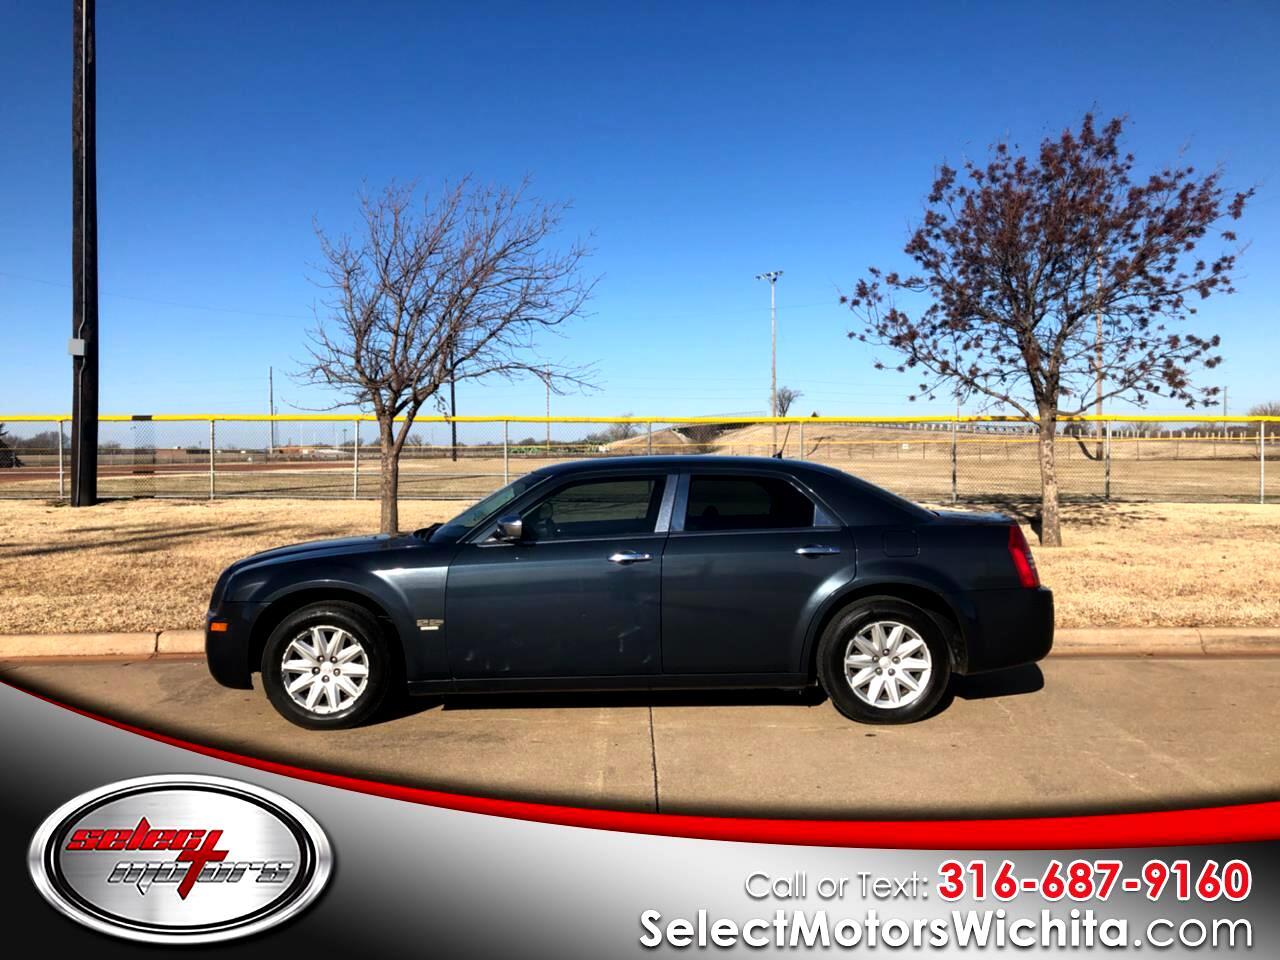 2008 Chrysler 300 4dr Sdn 300 LX RWD